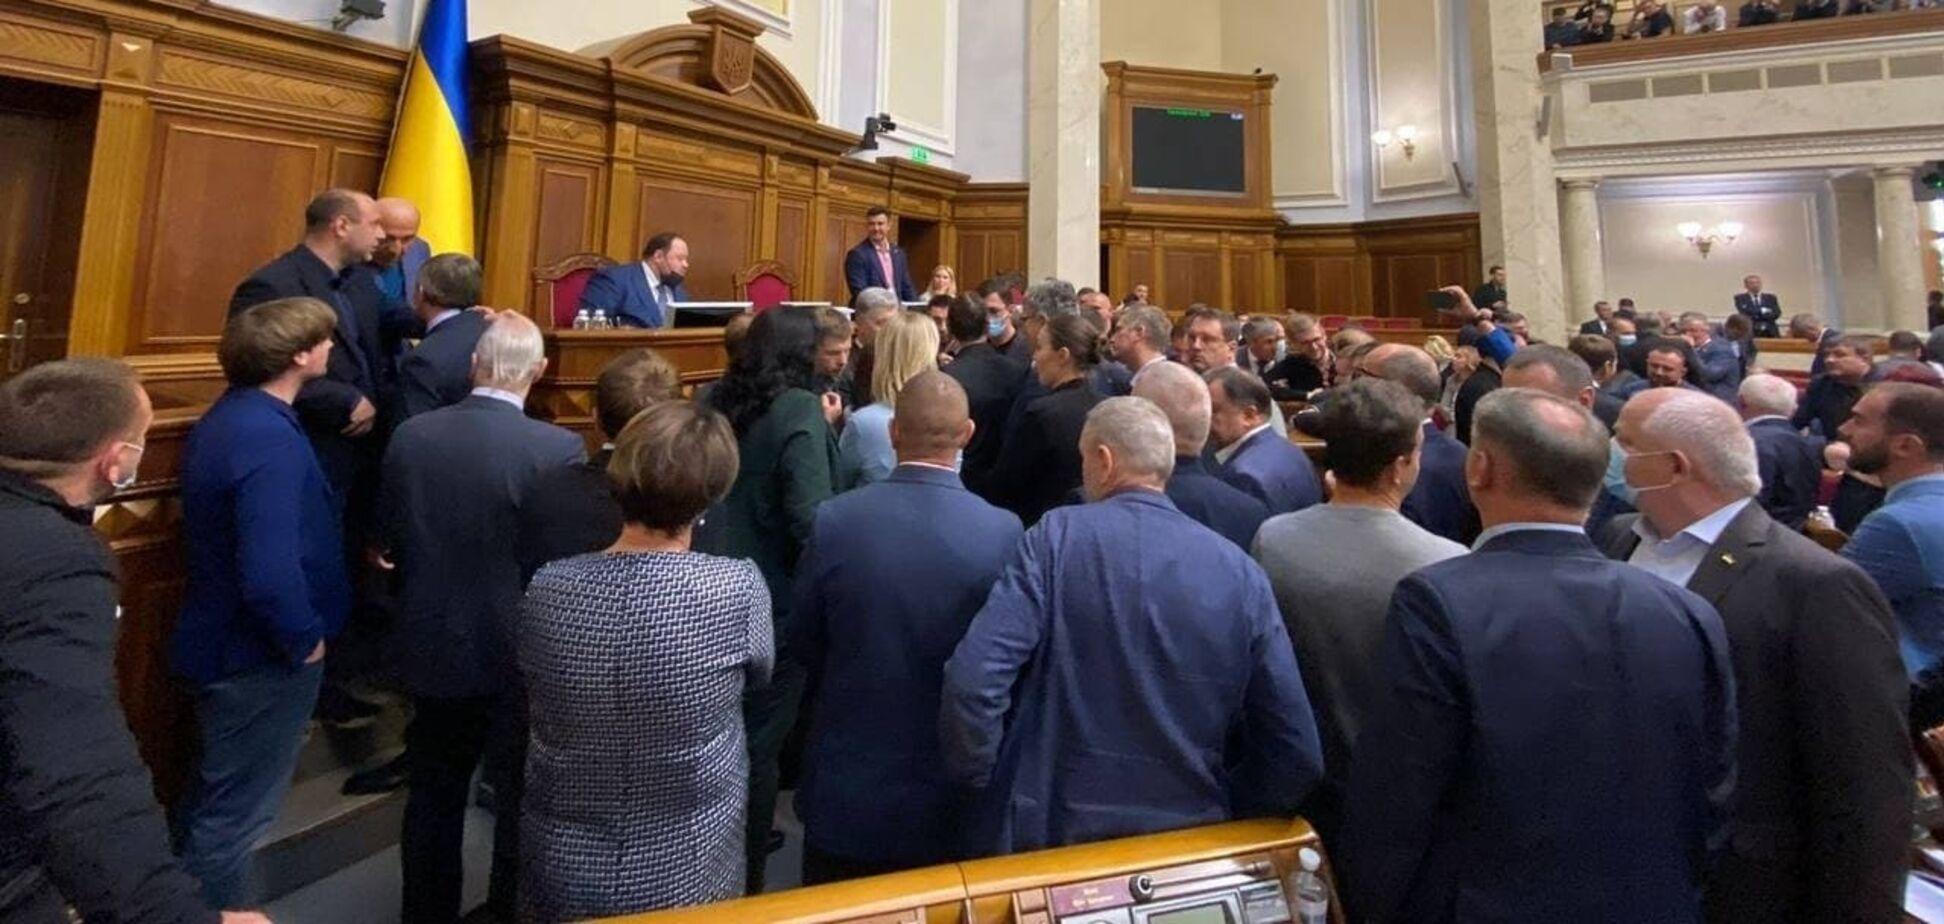 В Раде блокировали трибуну из-за закона об олигархах